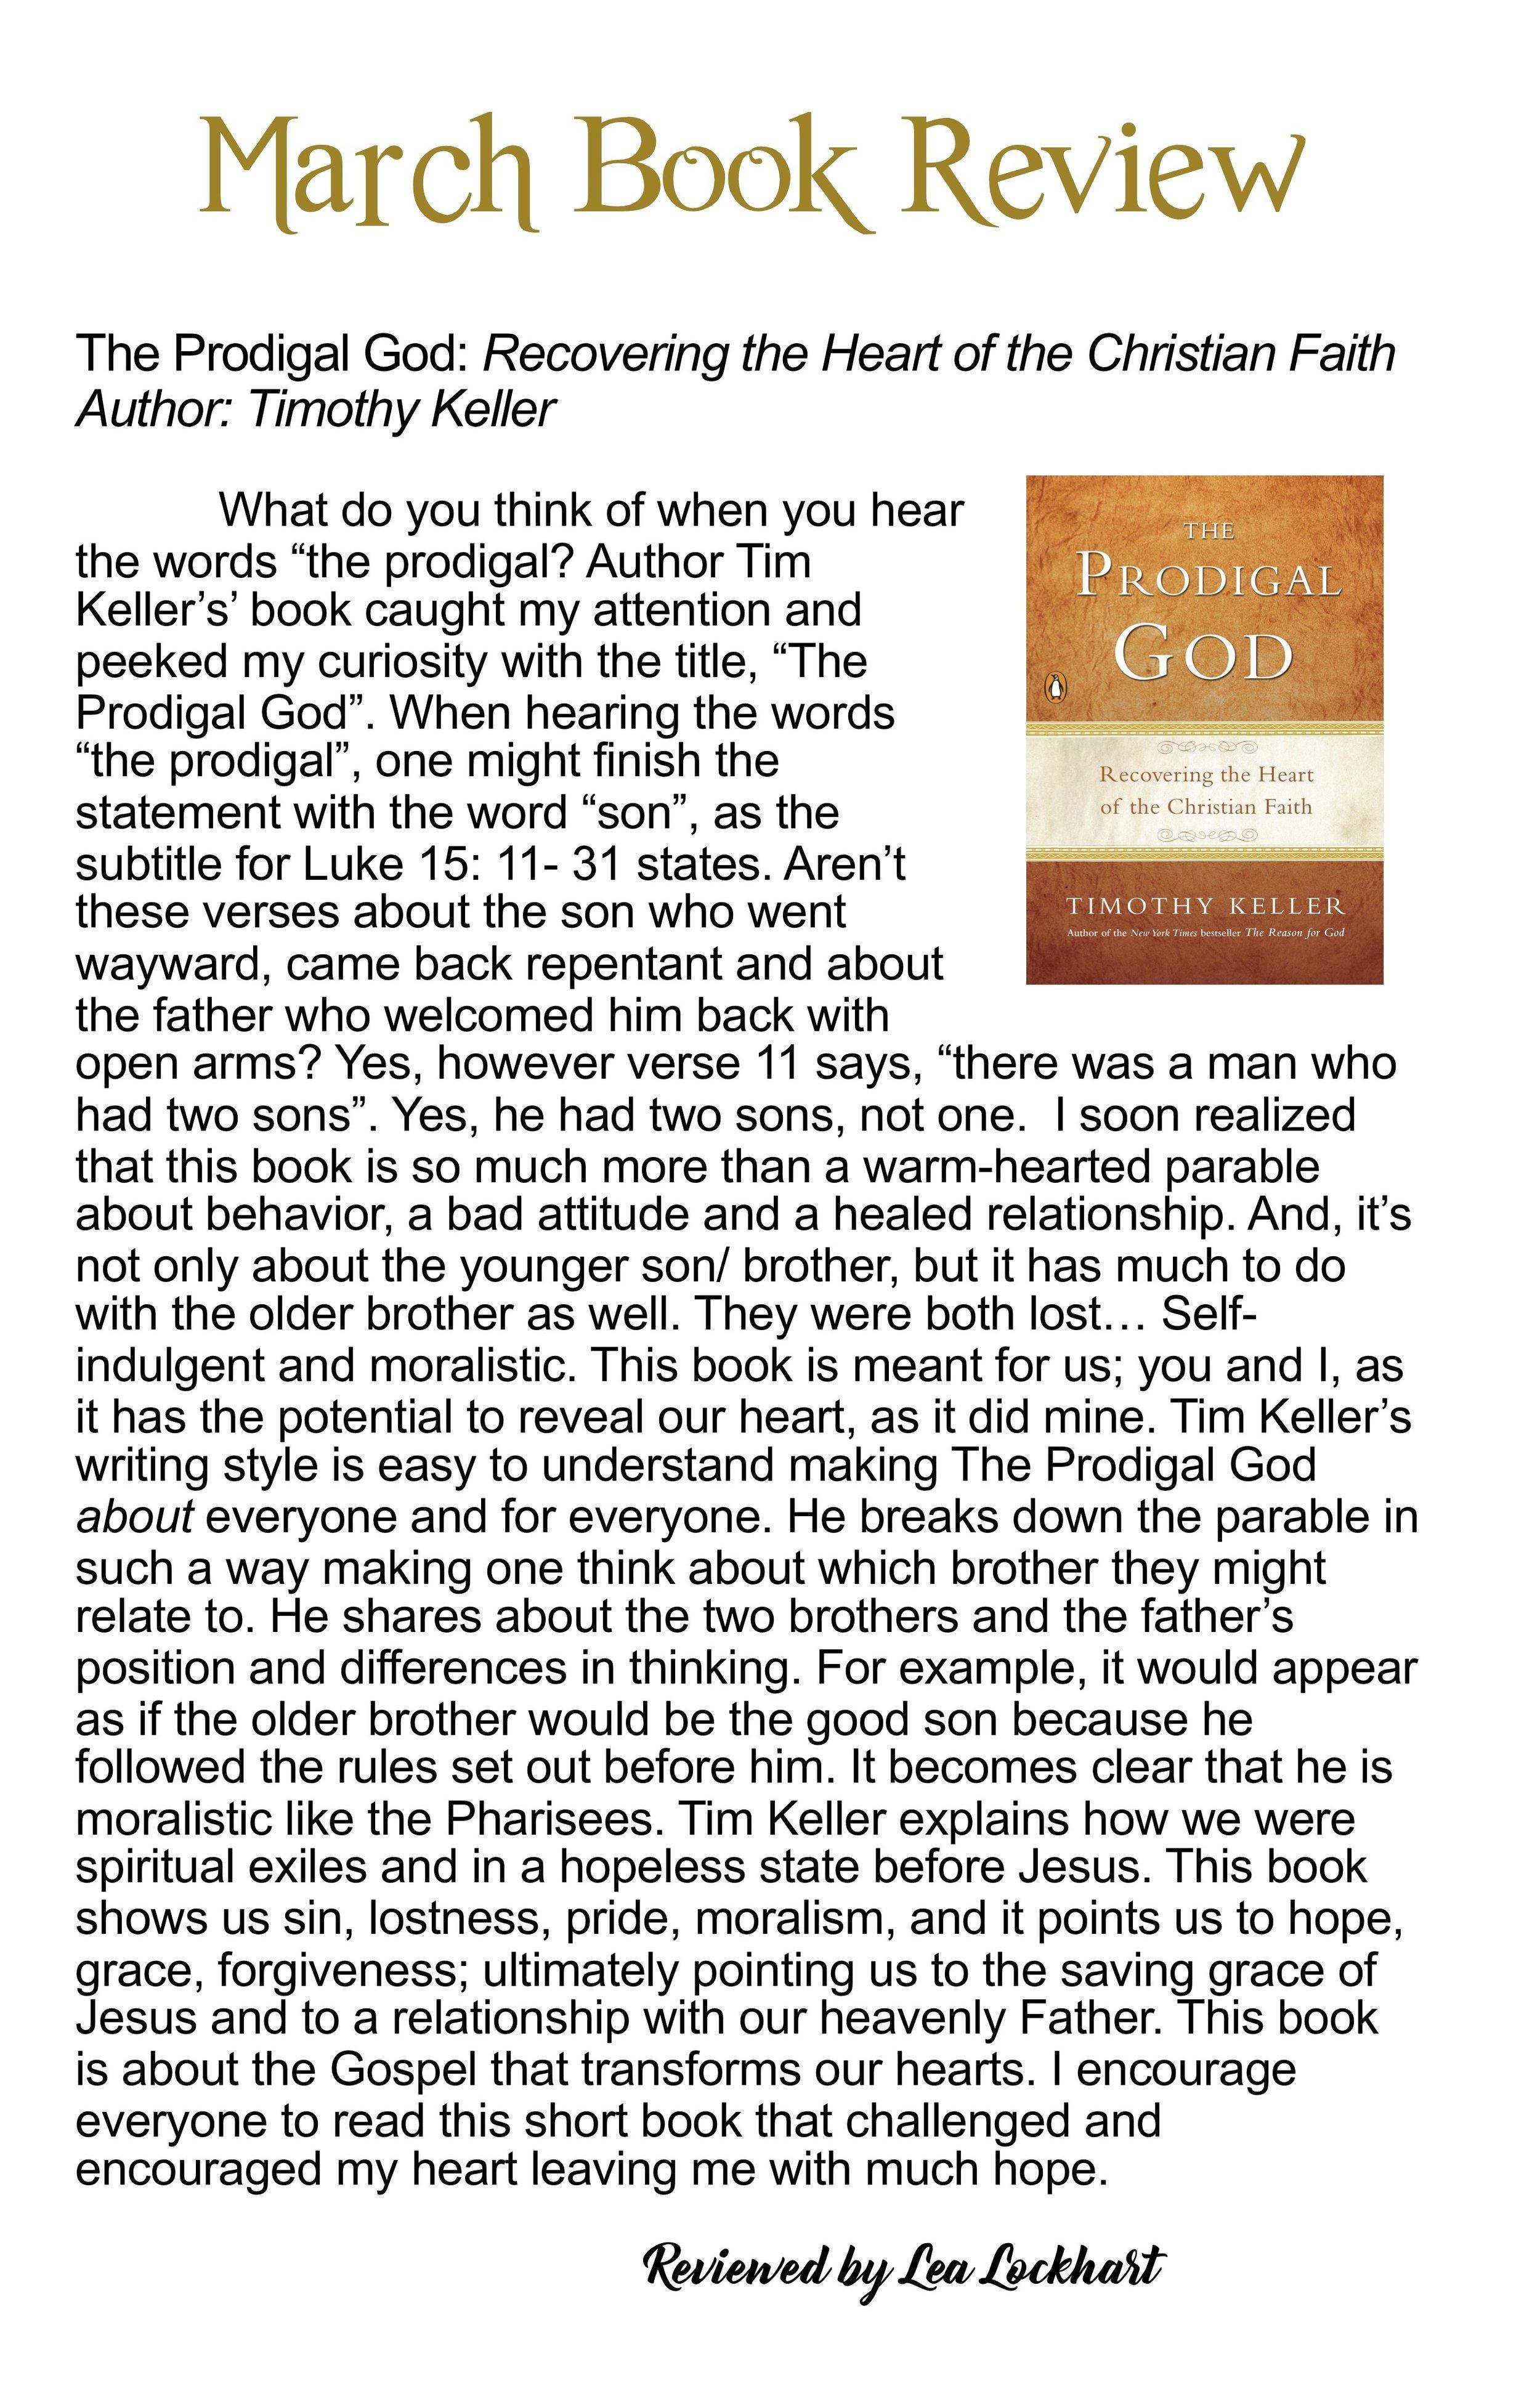 Book Reviews pg2 copy.jpg